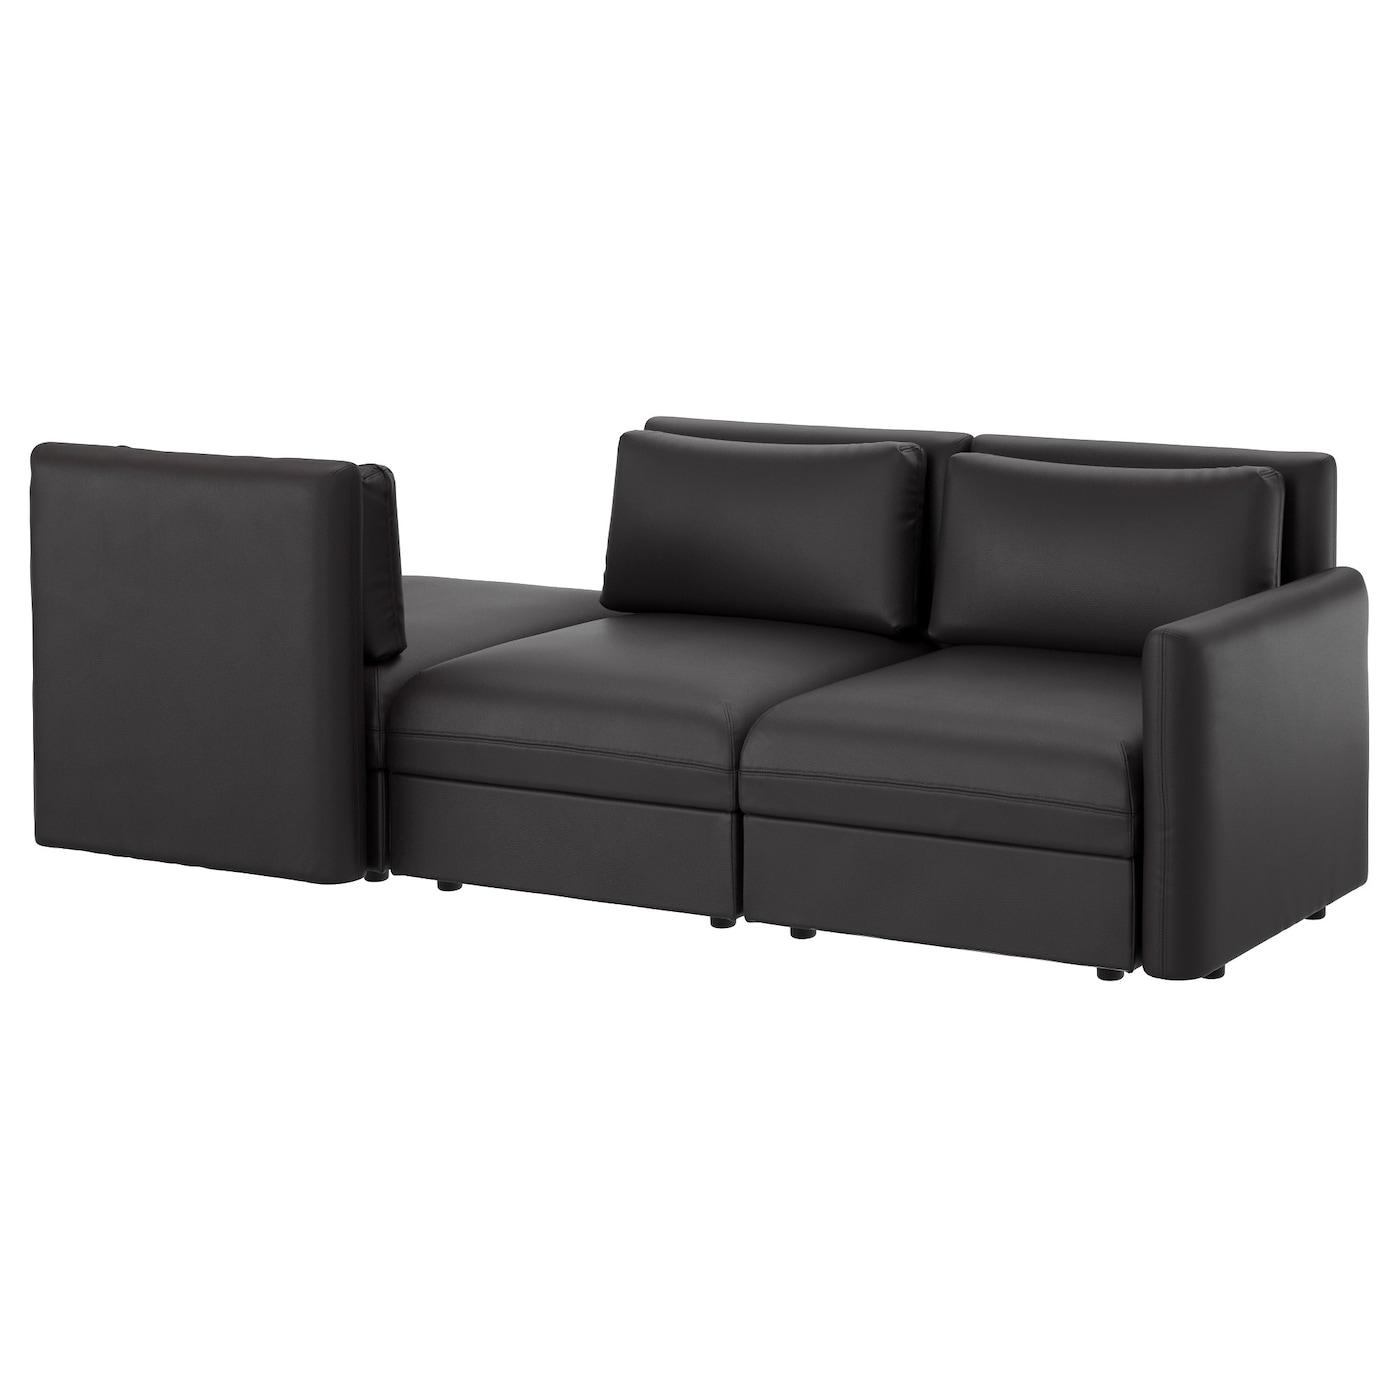 VALLENTUNA, 3er-Sofa, Murum schwarz, schwarz 191.626.05